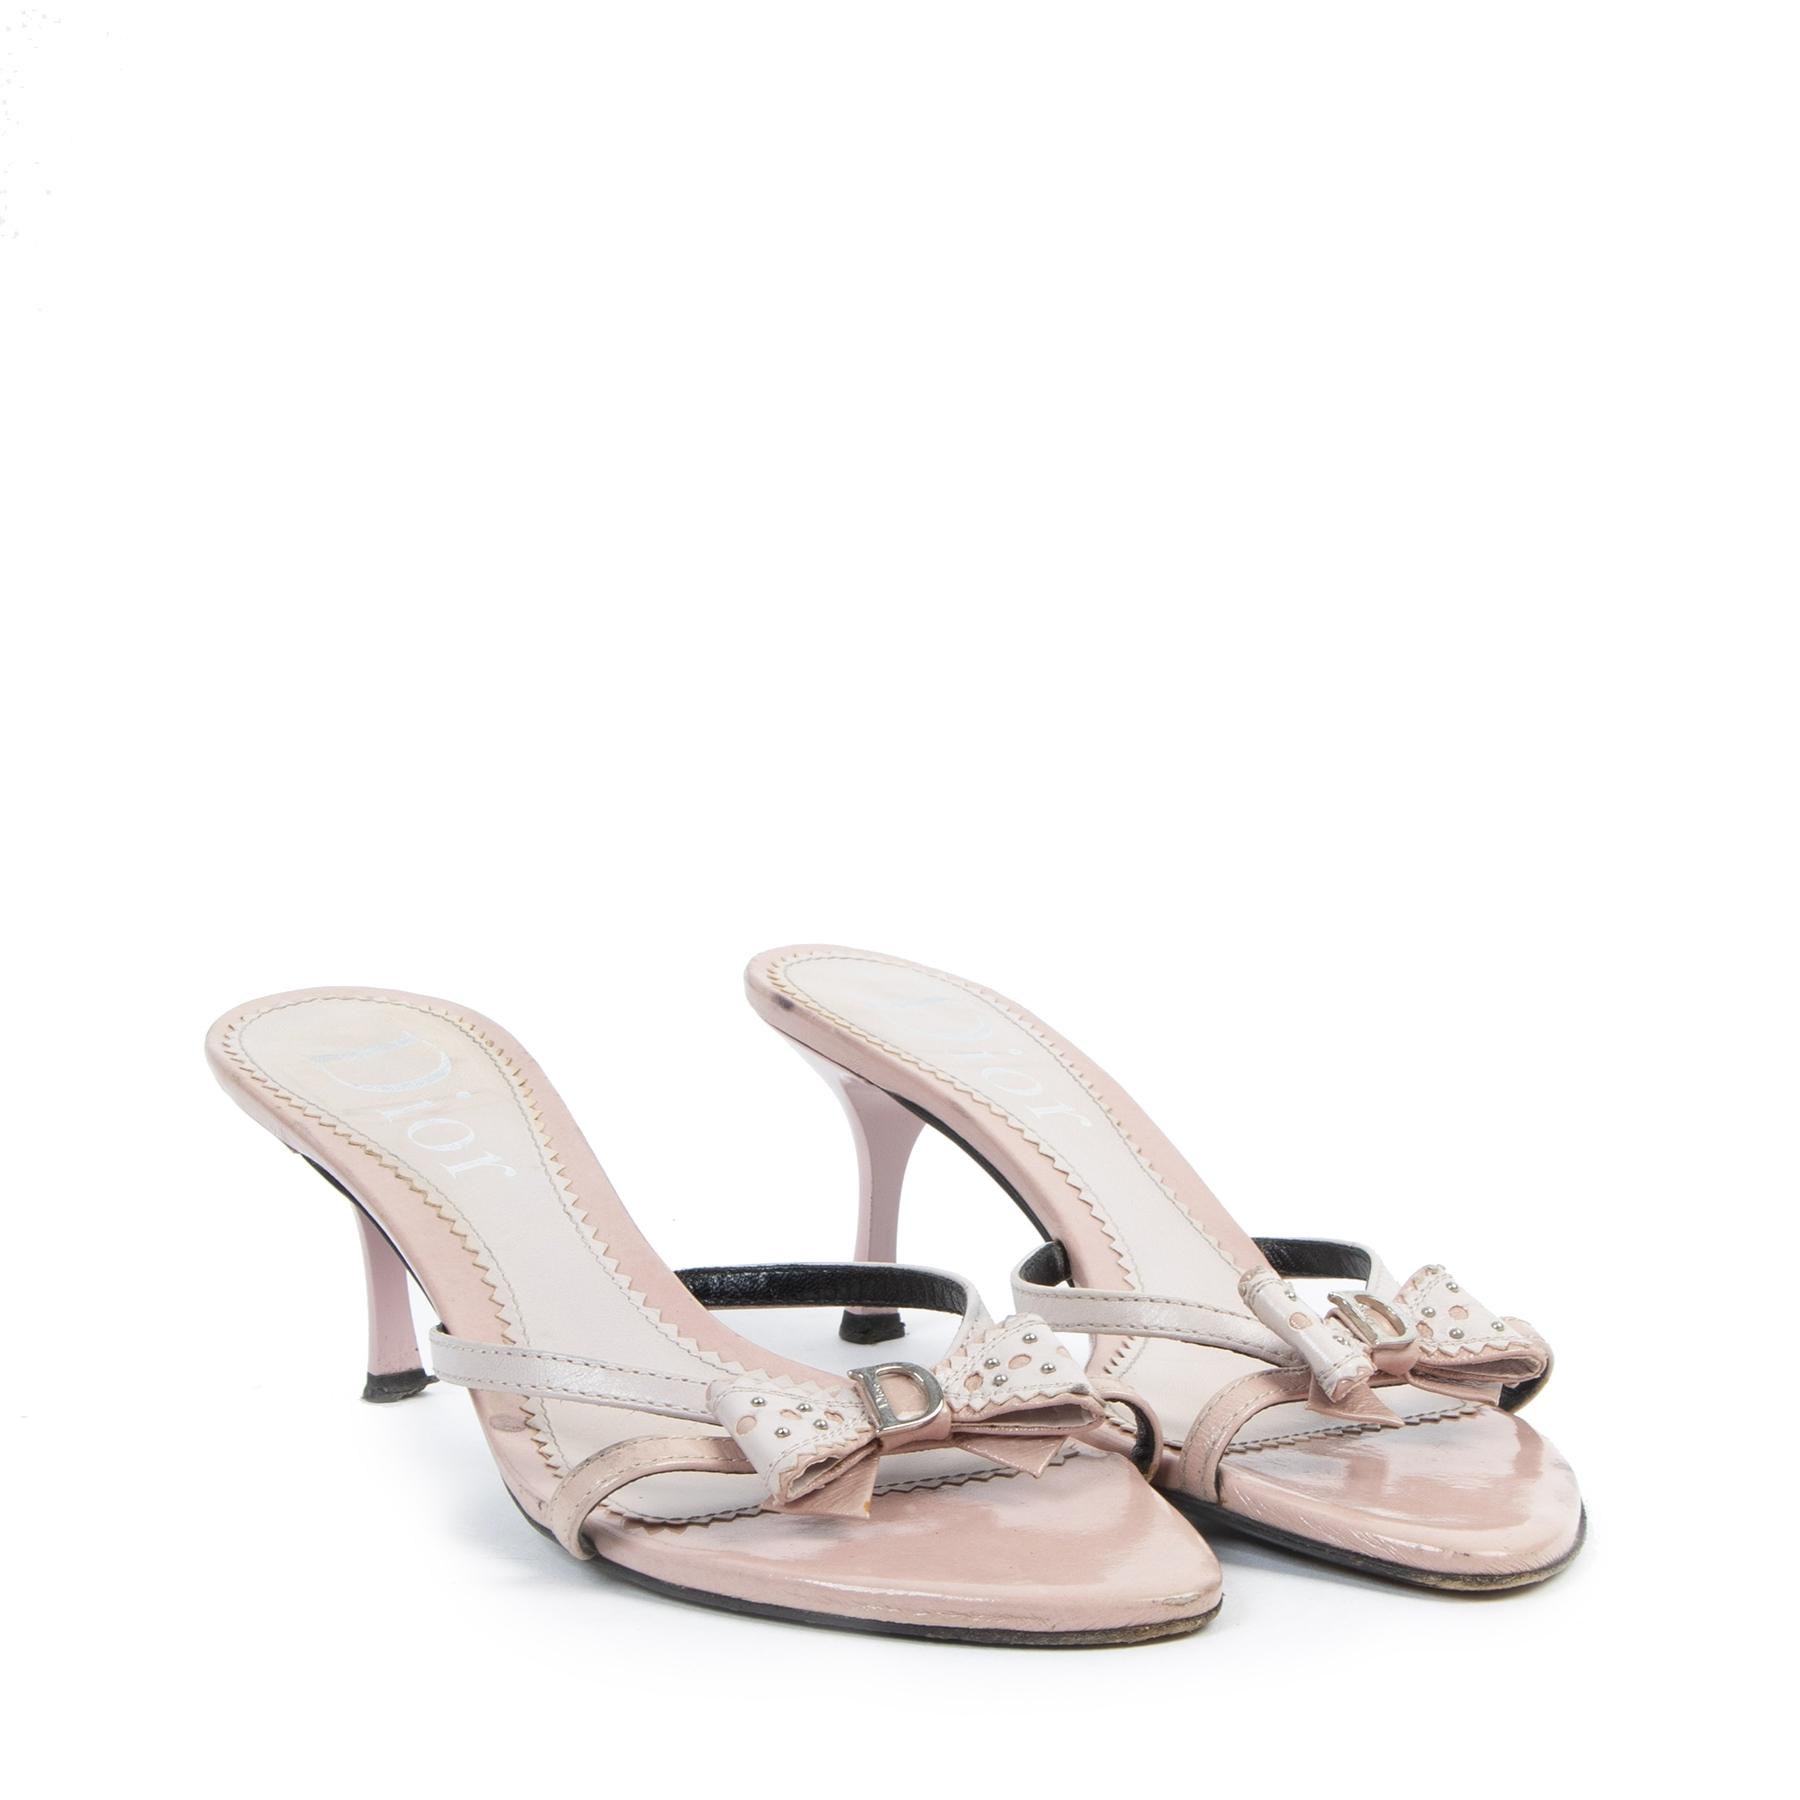 Authentic secondhand Dior Pink Sandal Mules - size 40 designer bags fashion luxury vintage webshop safe secure online shopping worldwide shipping designer high end brands